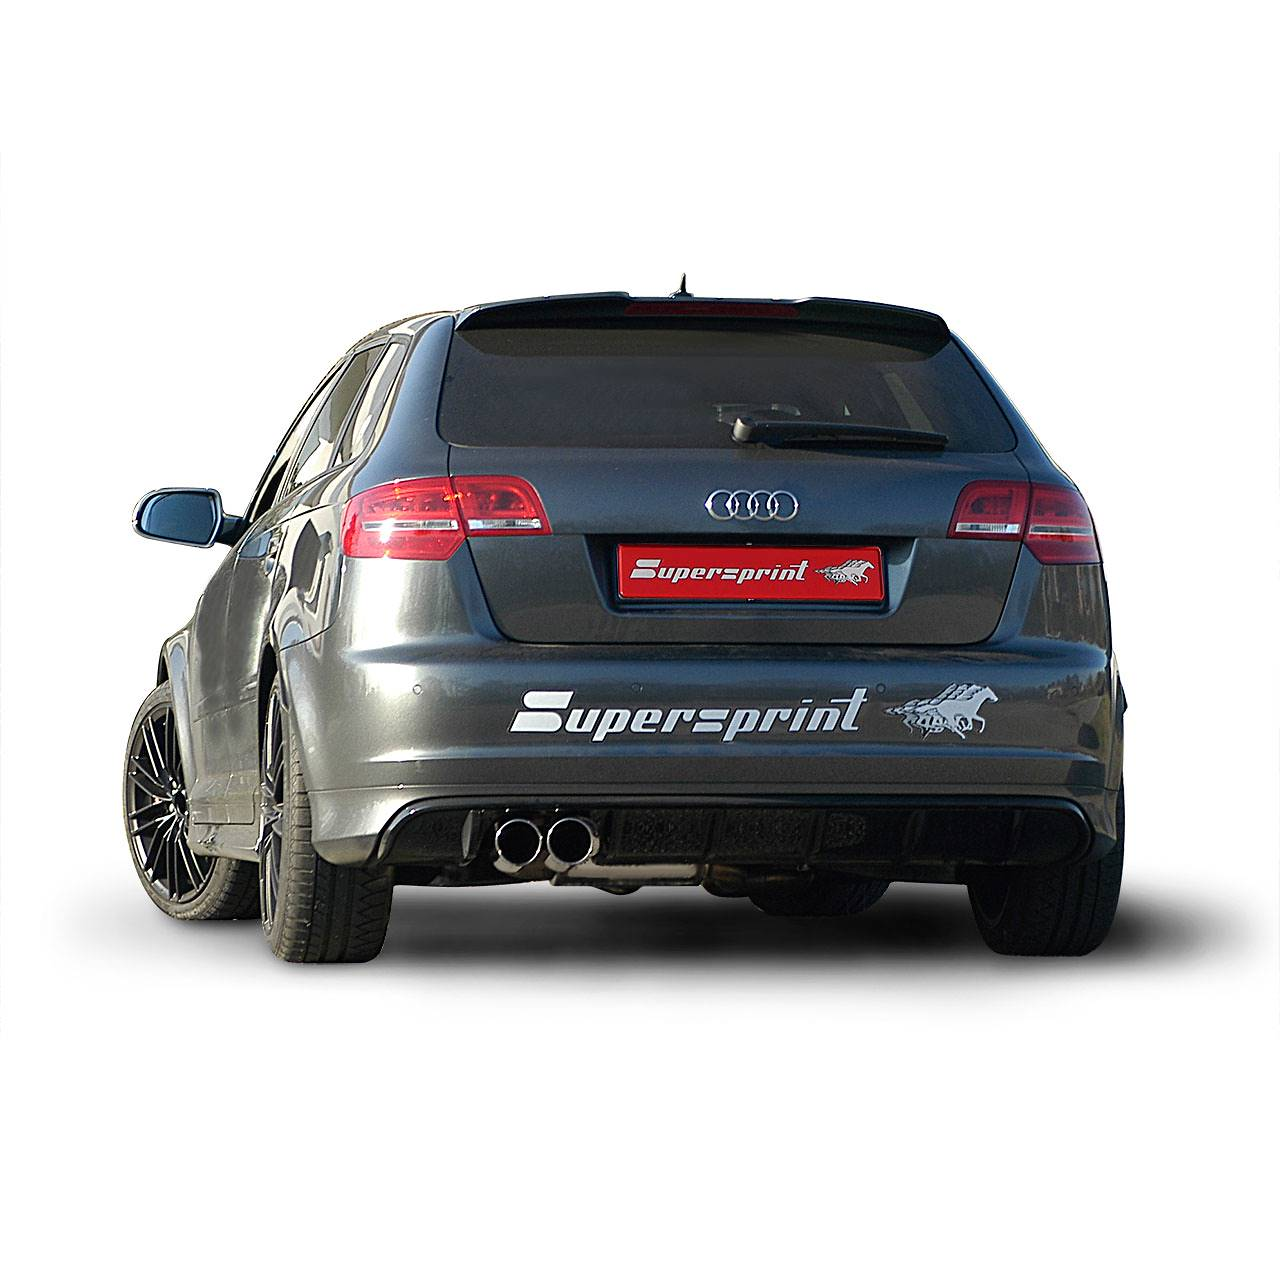 audi a3 rs3 sportback quattro 2 5 tfsi 340 hp 2011. Black Bedroom Furniture Sets. Home Design Ideas